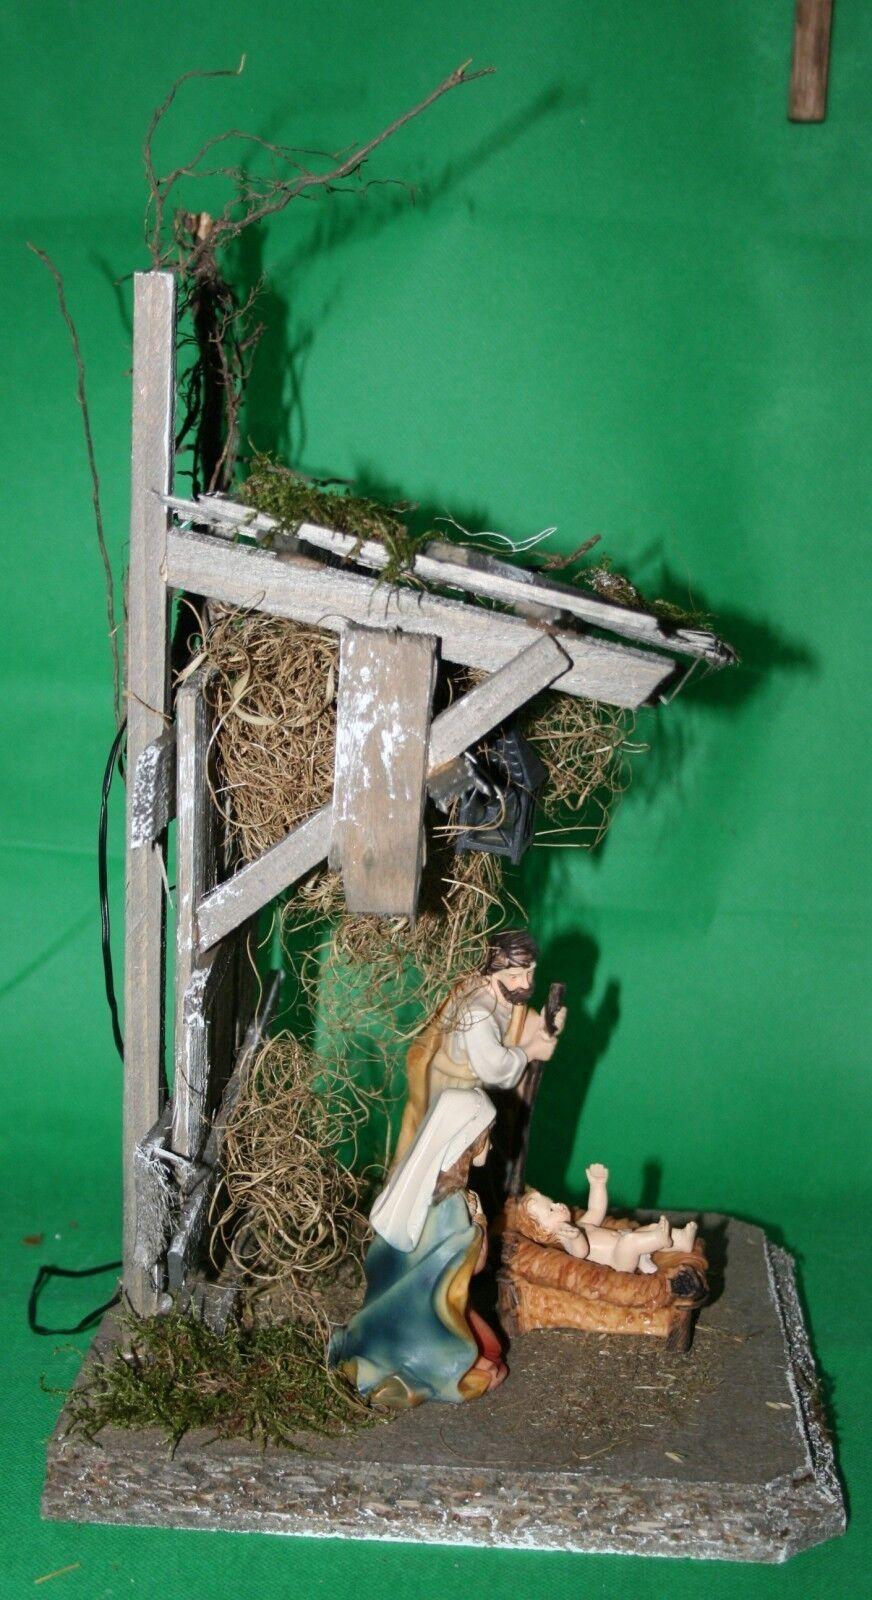 krippe weihnachten holz mit figurenset heilige familie beleuchtung 34x20x20 cm eur 46 95. Black Bedroom Furniture Sets. Home Design Ideas